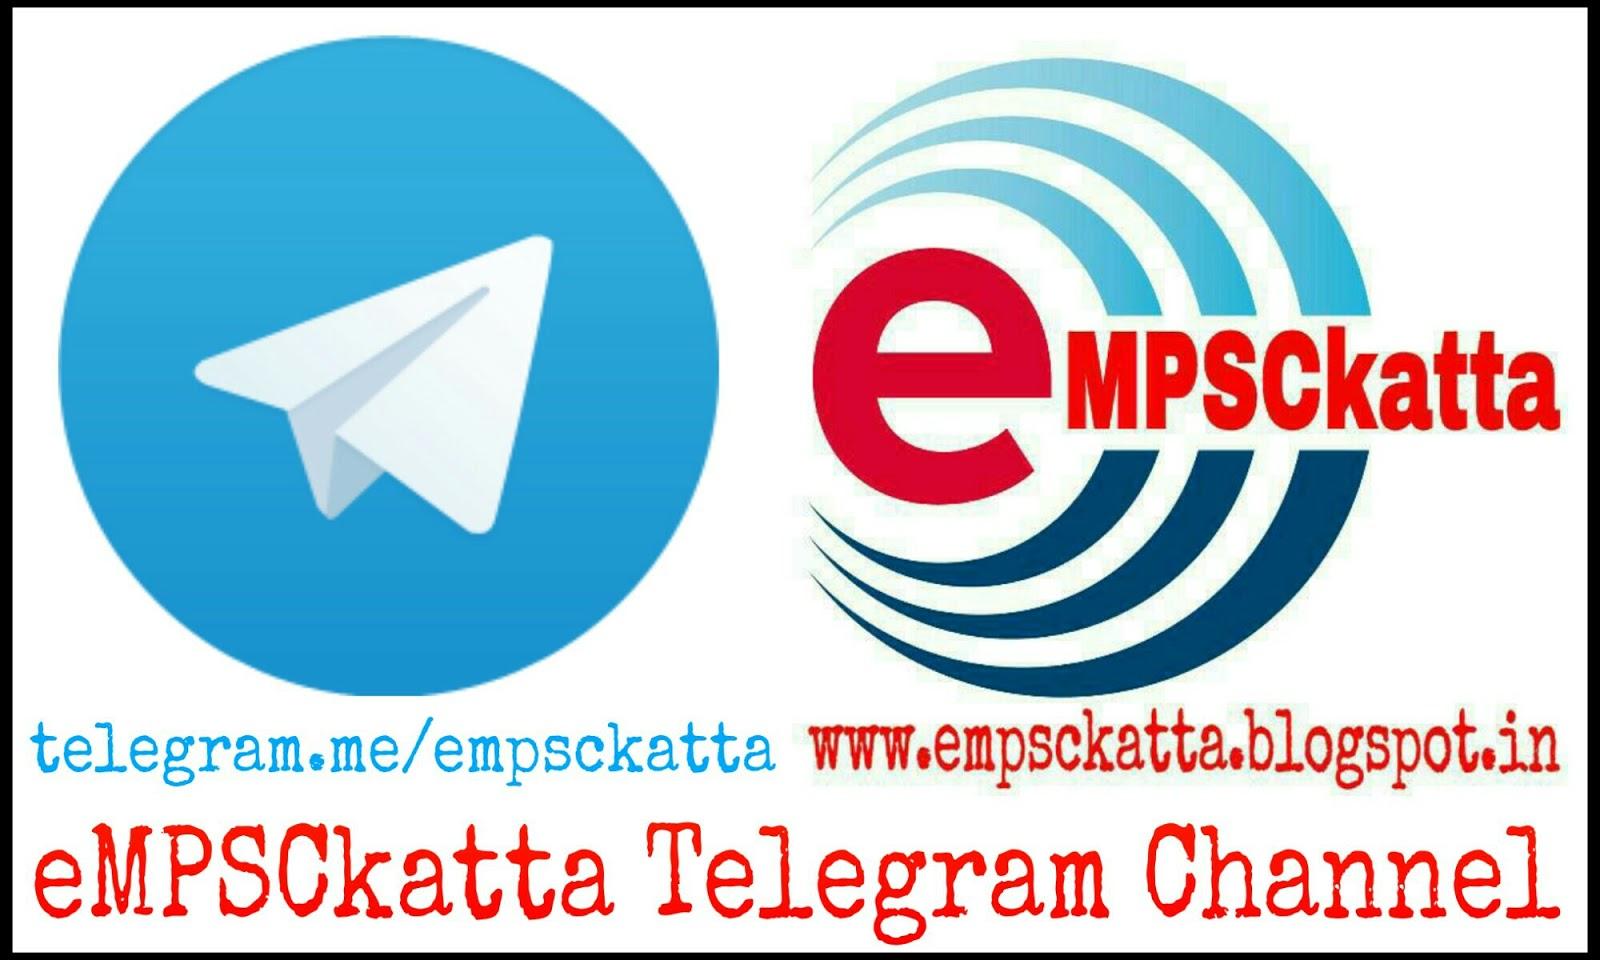 Csat telegram channel